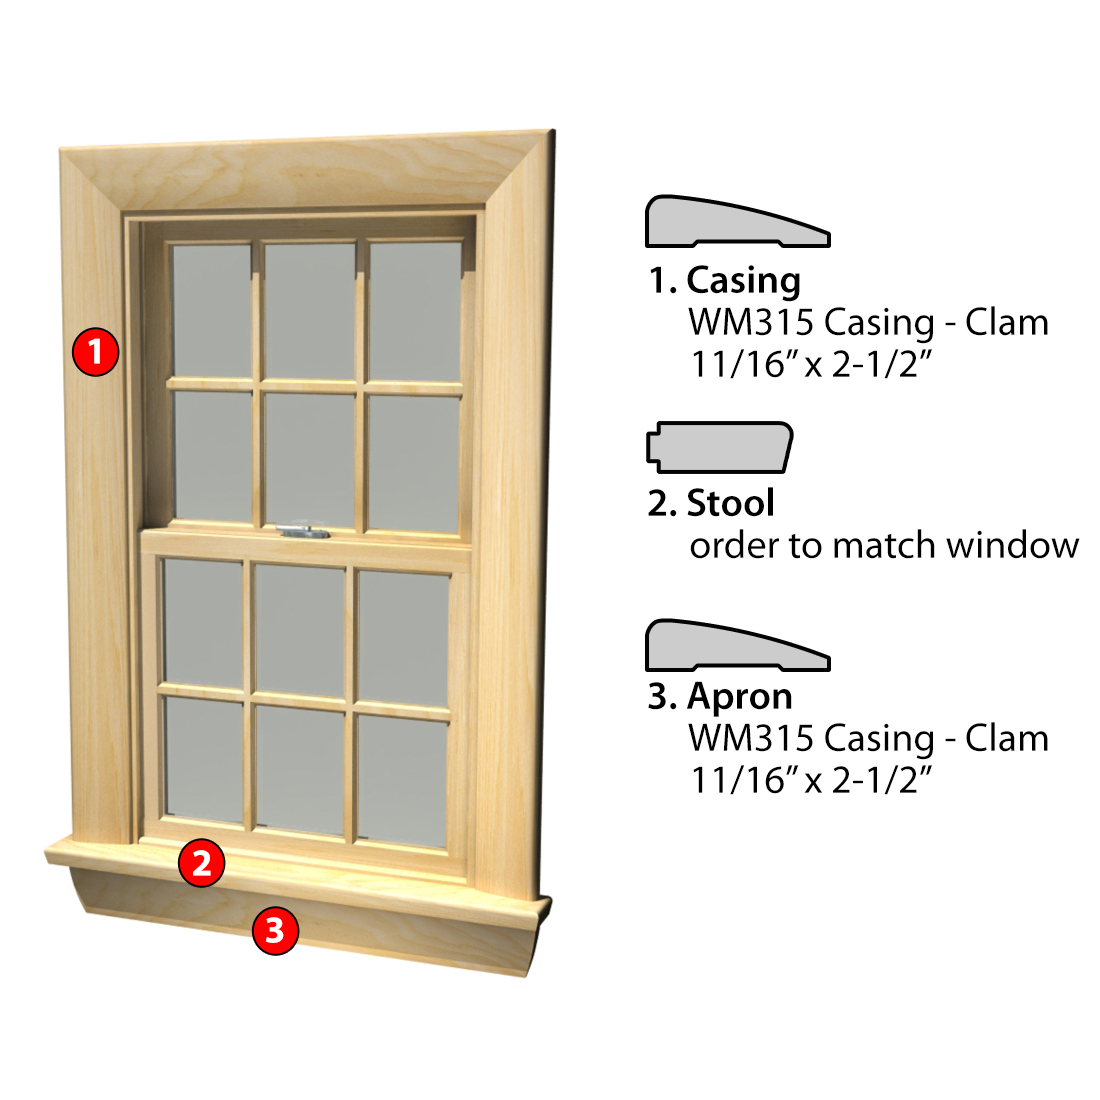 MSG ASSEMBLED WINDOW CASING 3SSA WM315